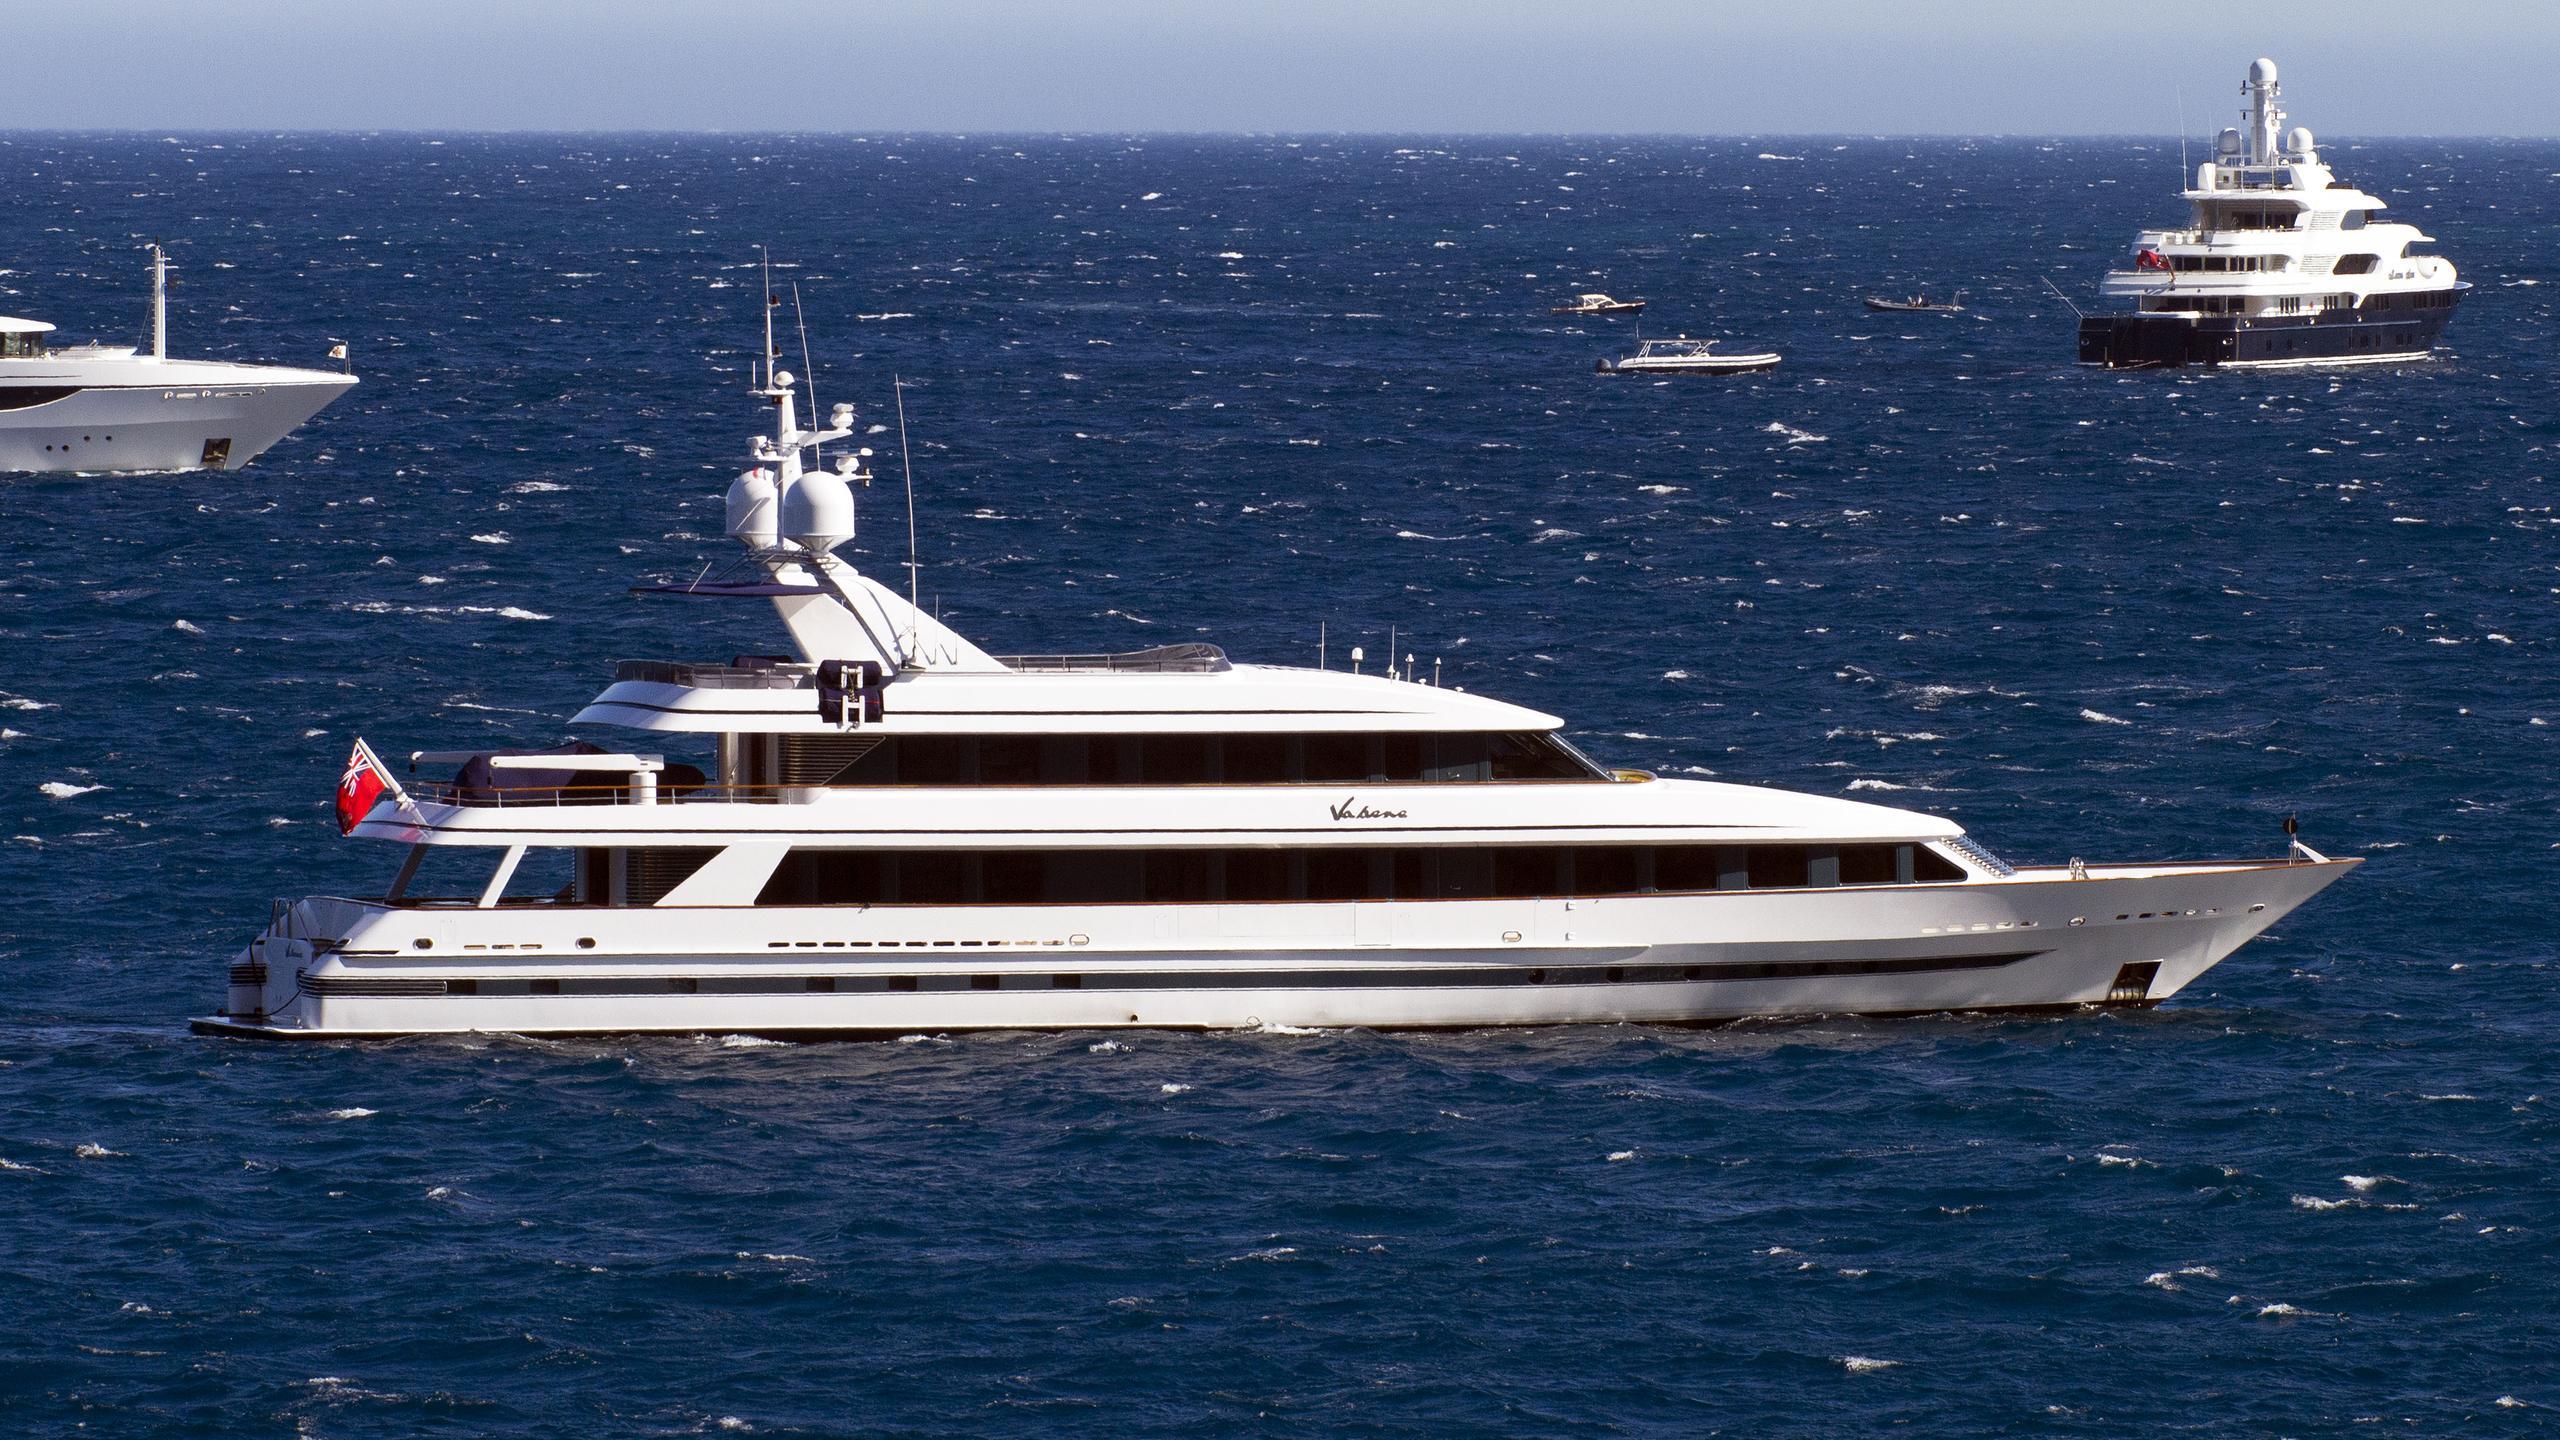 va-bene-motor-yacht-cornelissen-1992-46m-profile